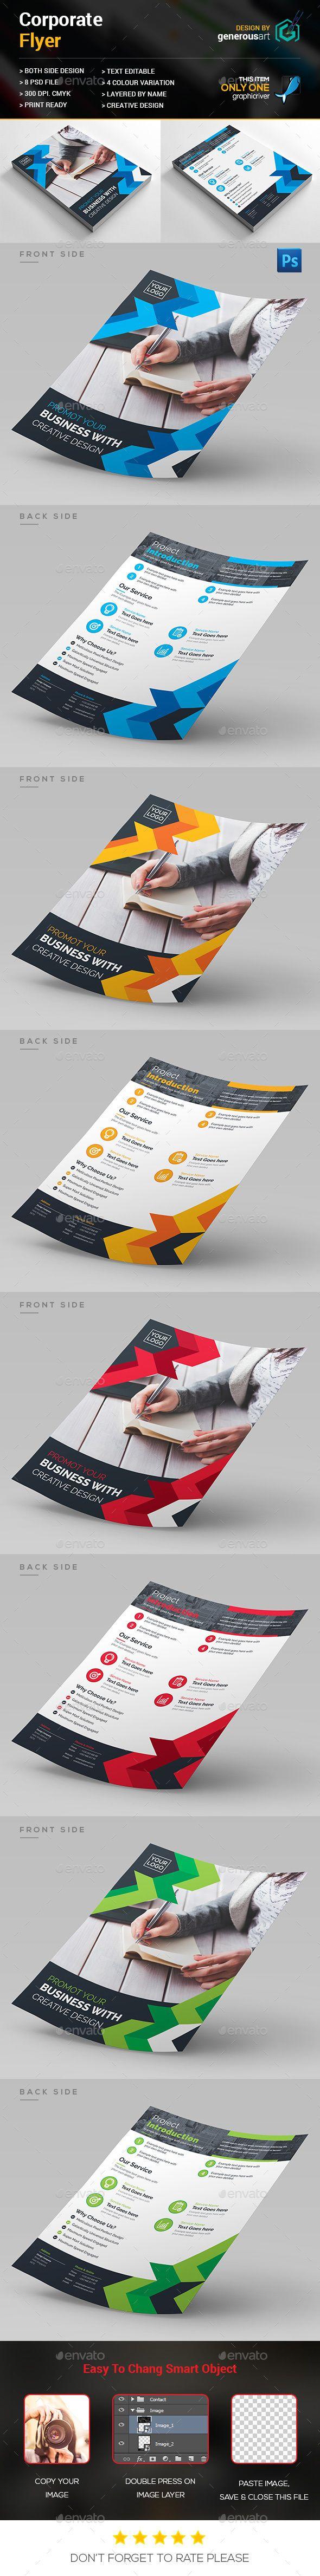 Creative Flyer Template PSD. Download here: http://graphicriver.net/item/creative-flyer/15223211?ref=ksioks